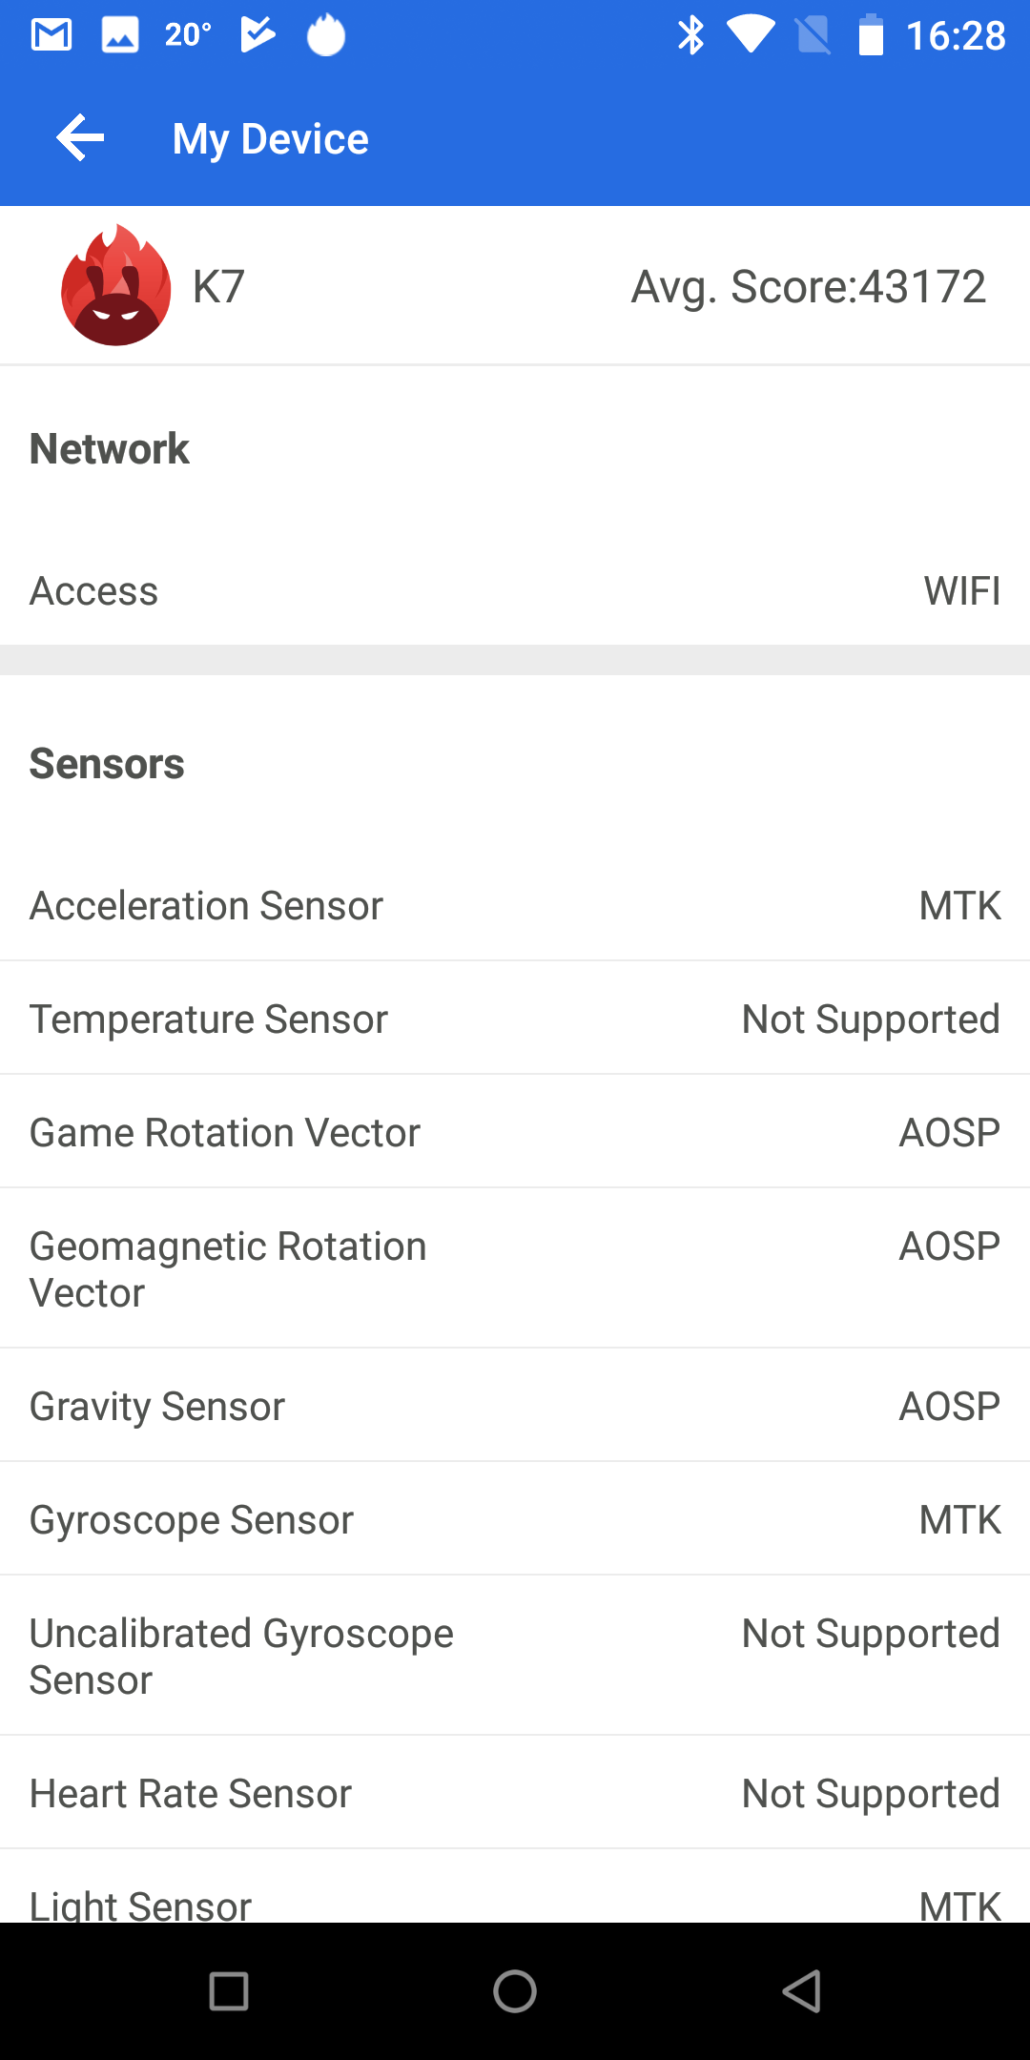 oukitel-k7-phone-review-05-part-8-antutu-network-sensors